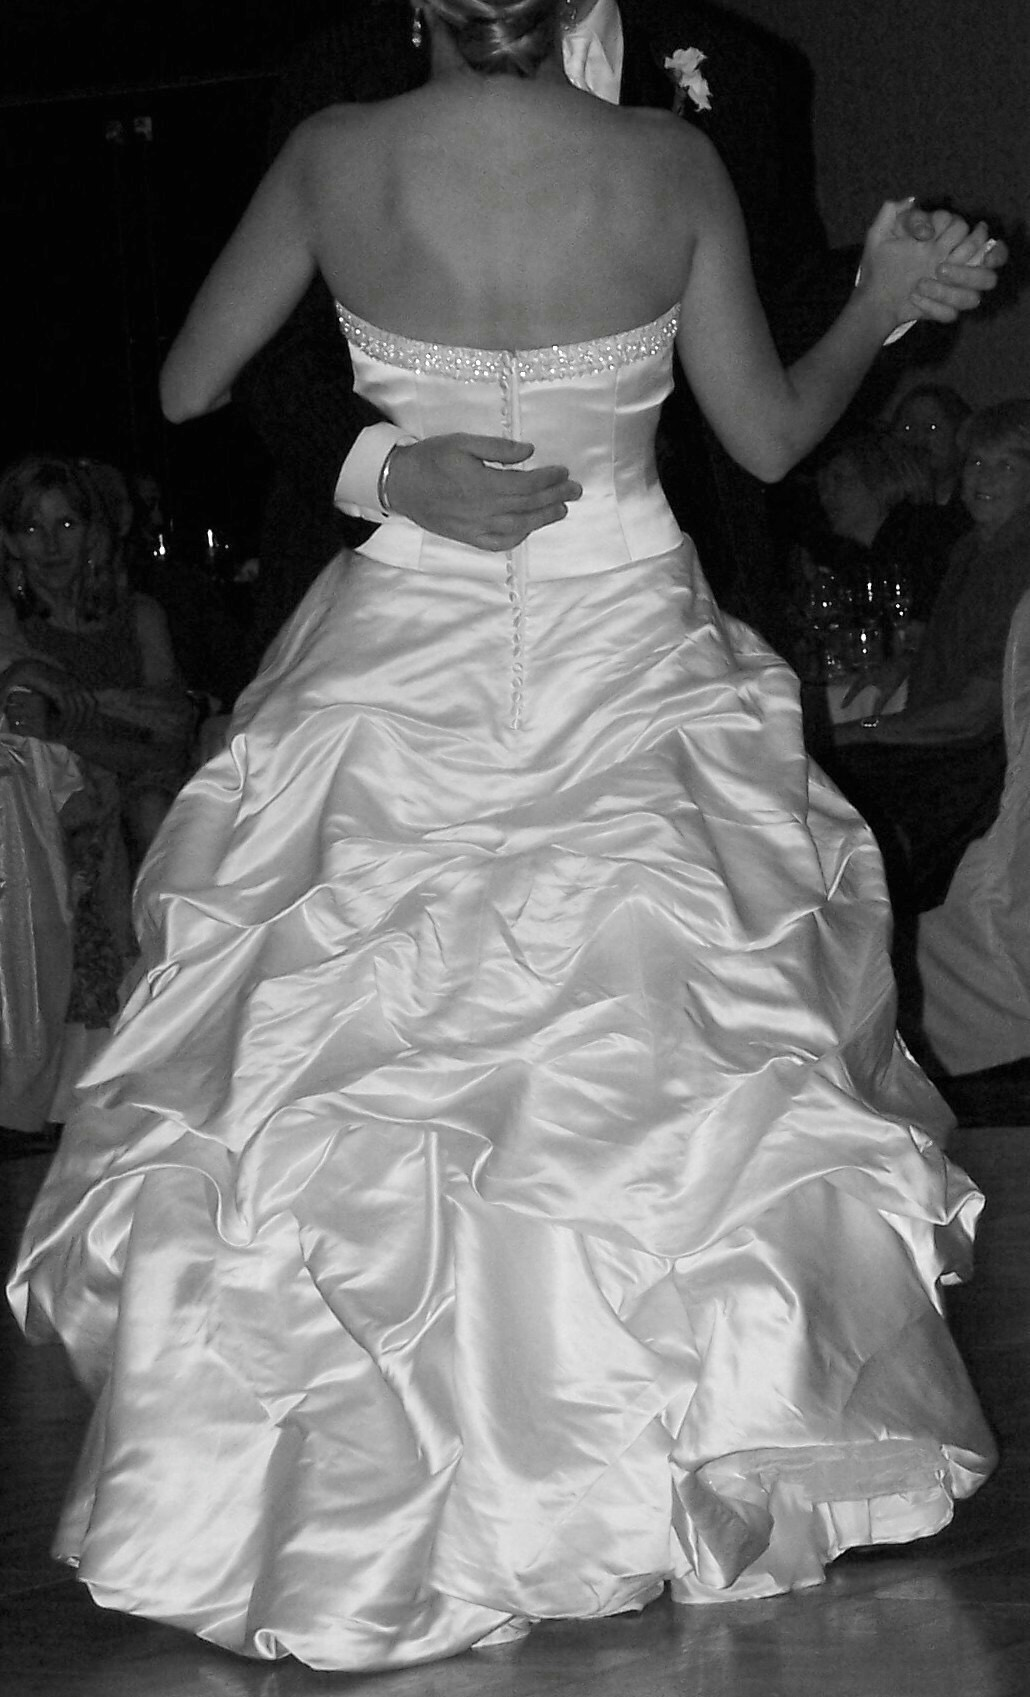 Allison & James' first dance at 7:53pm on September 15, 2007 (digital photo embeds it LOL)